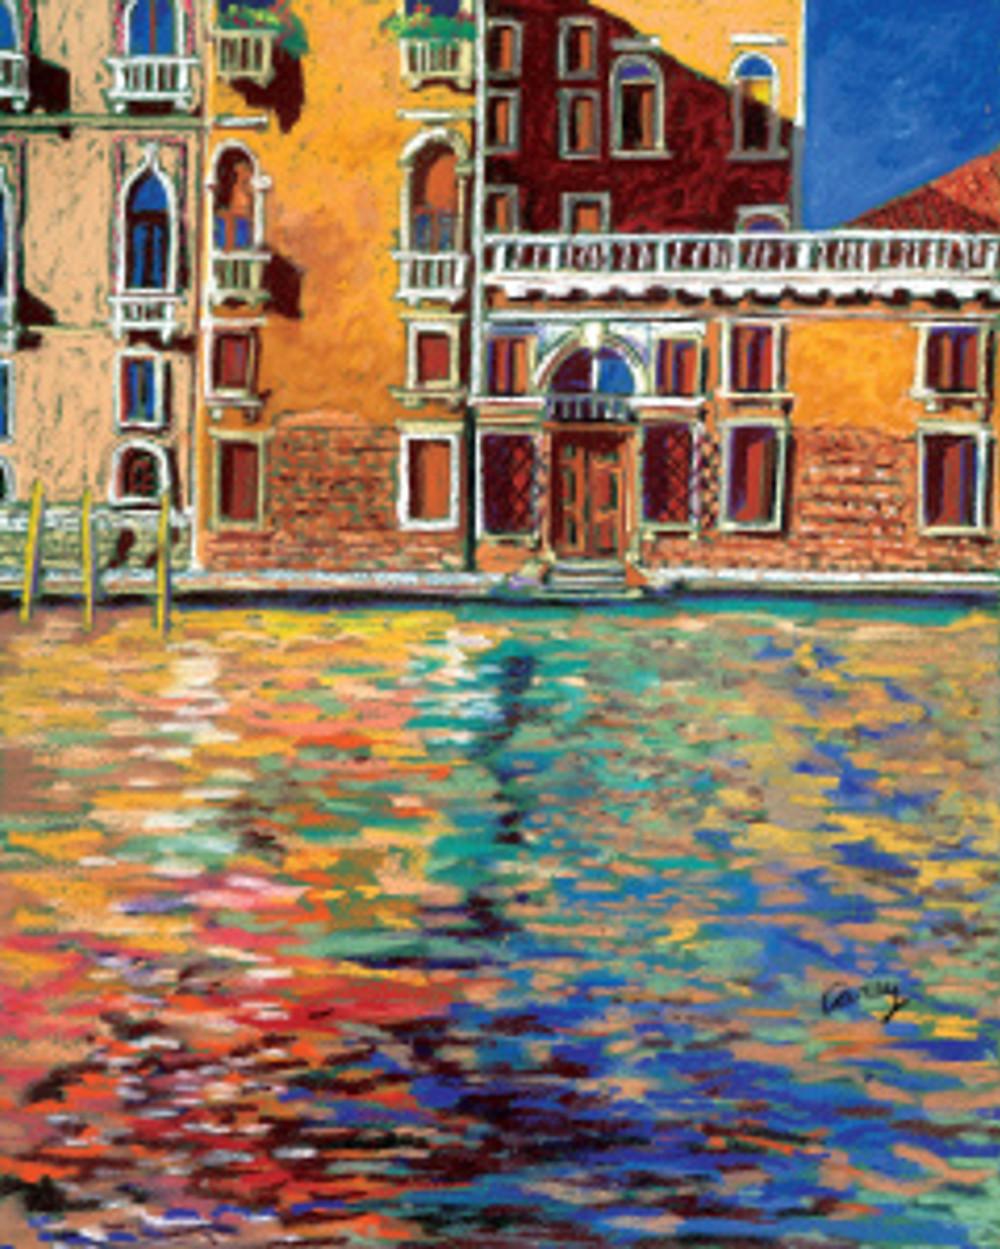 Bluest Sky in Venice by Cathy Carey 16 x 20 pastel